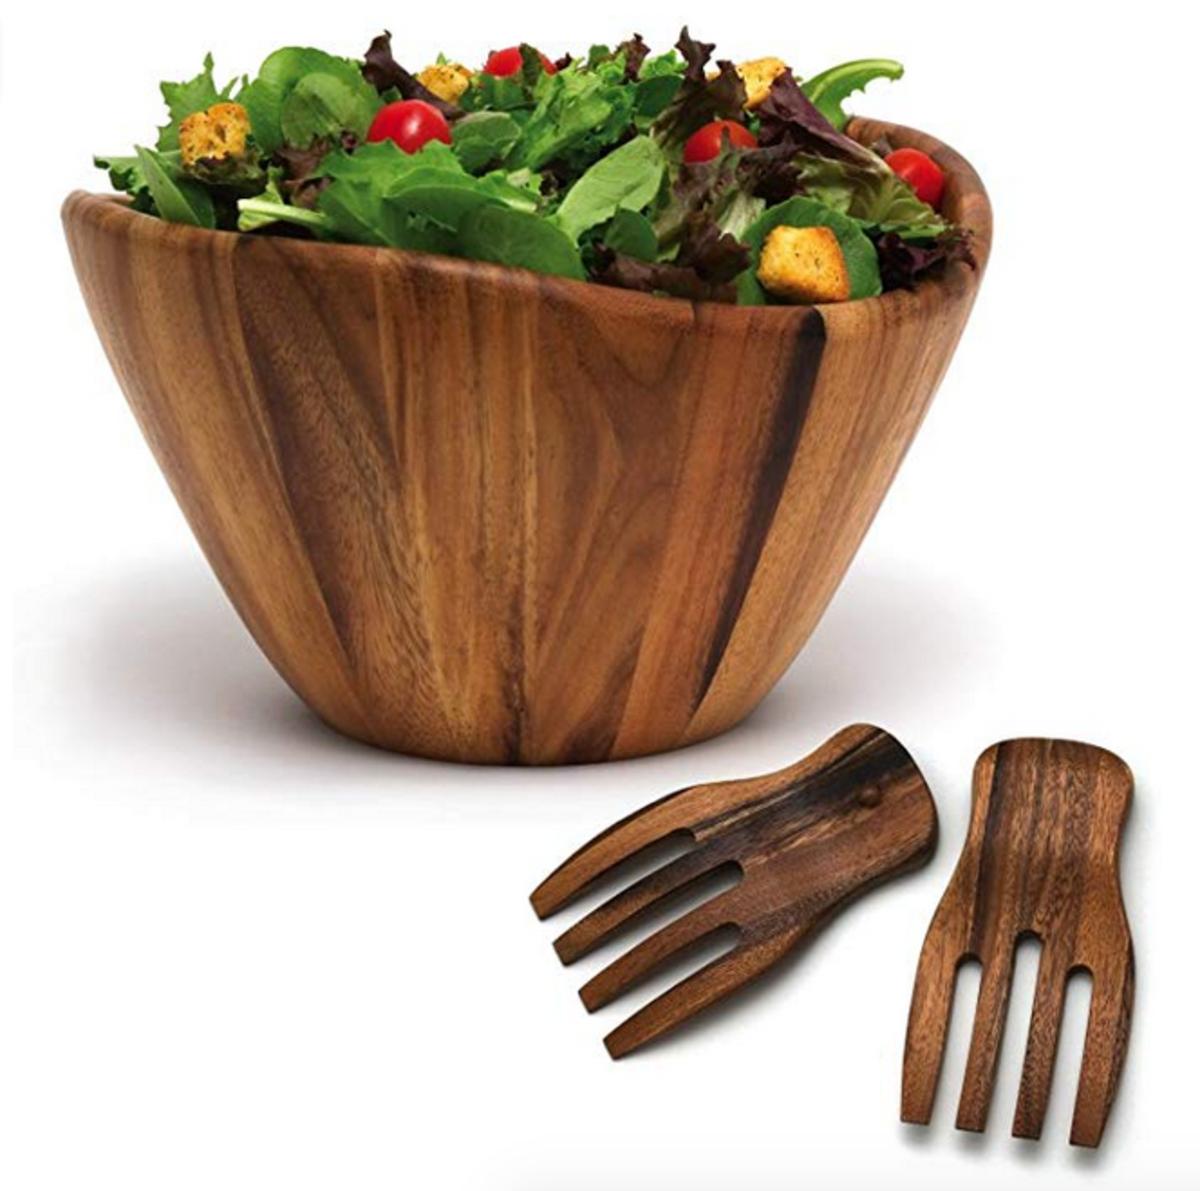 A wooden salad bowl and tongs.